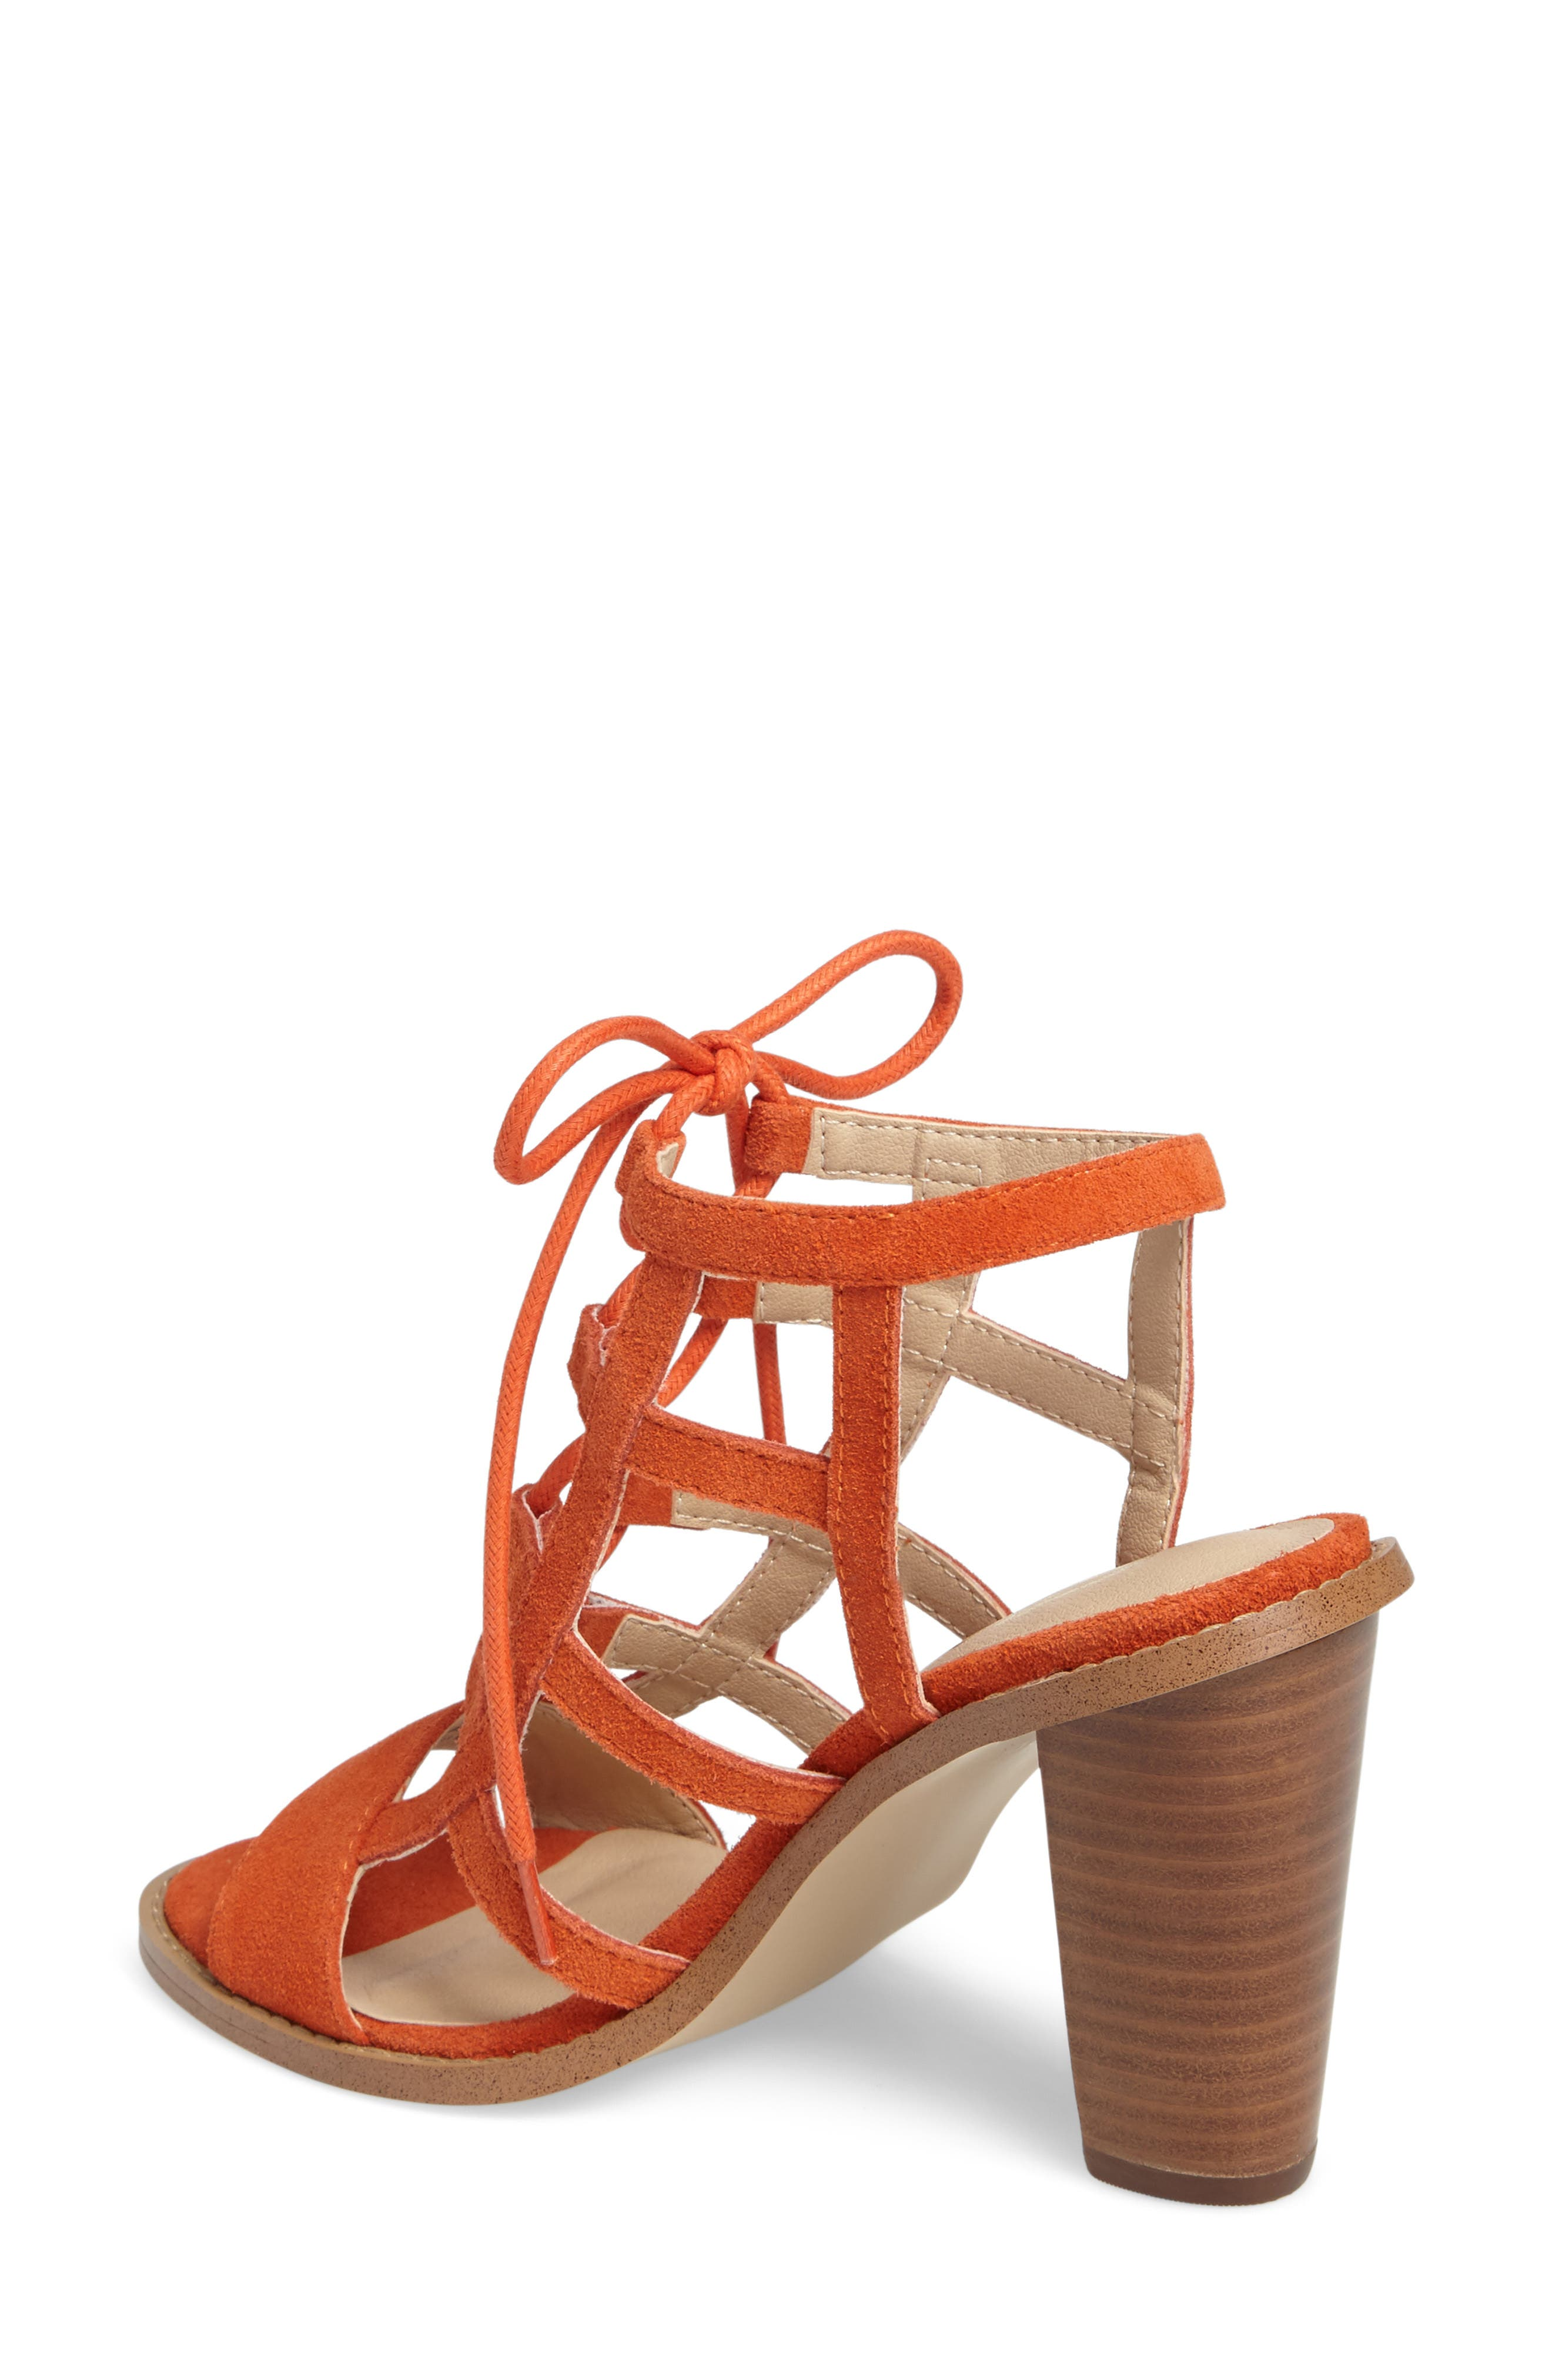 Sanni Cage Sandal,                             Alternate thumbnail 2, color,                             Orange Leather